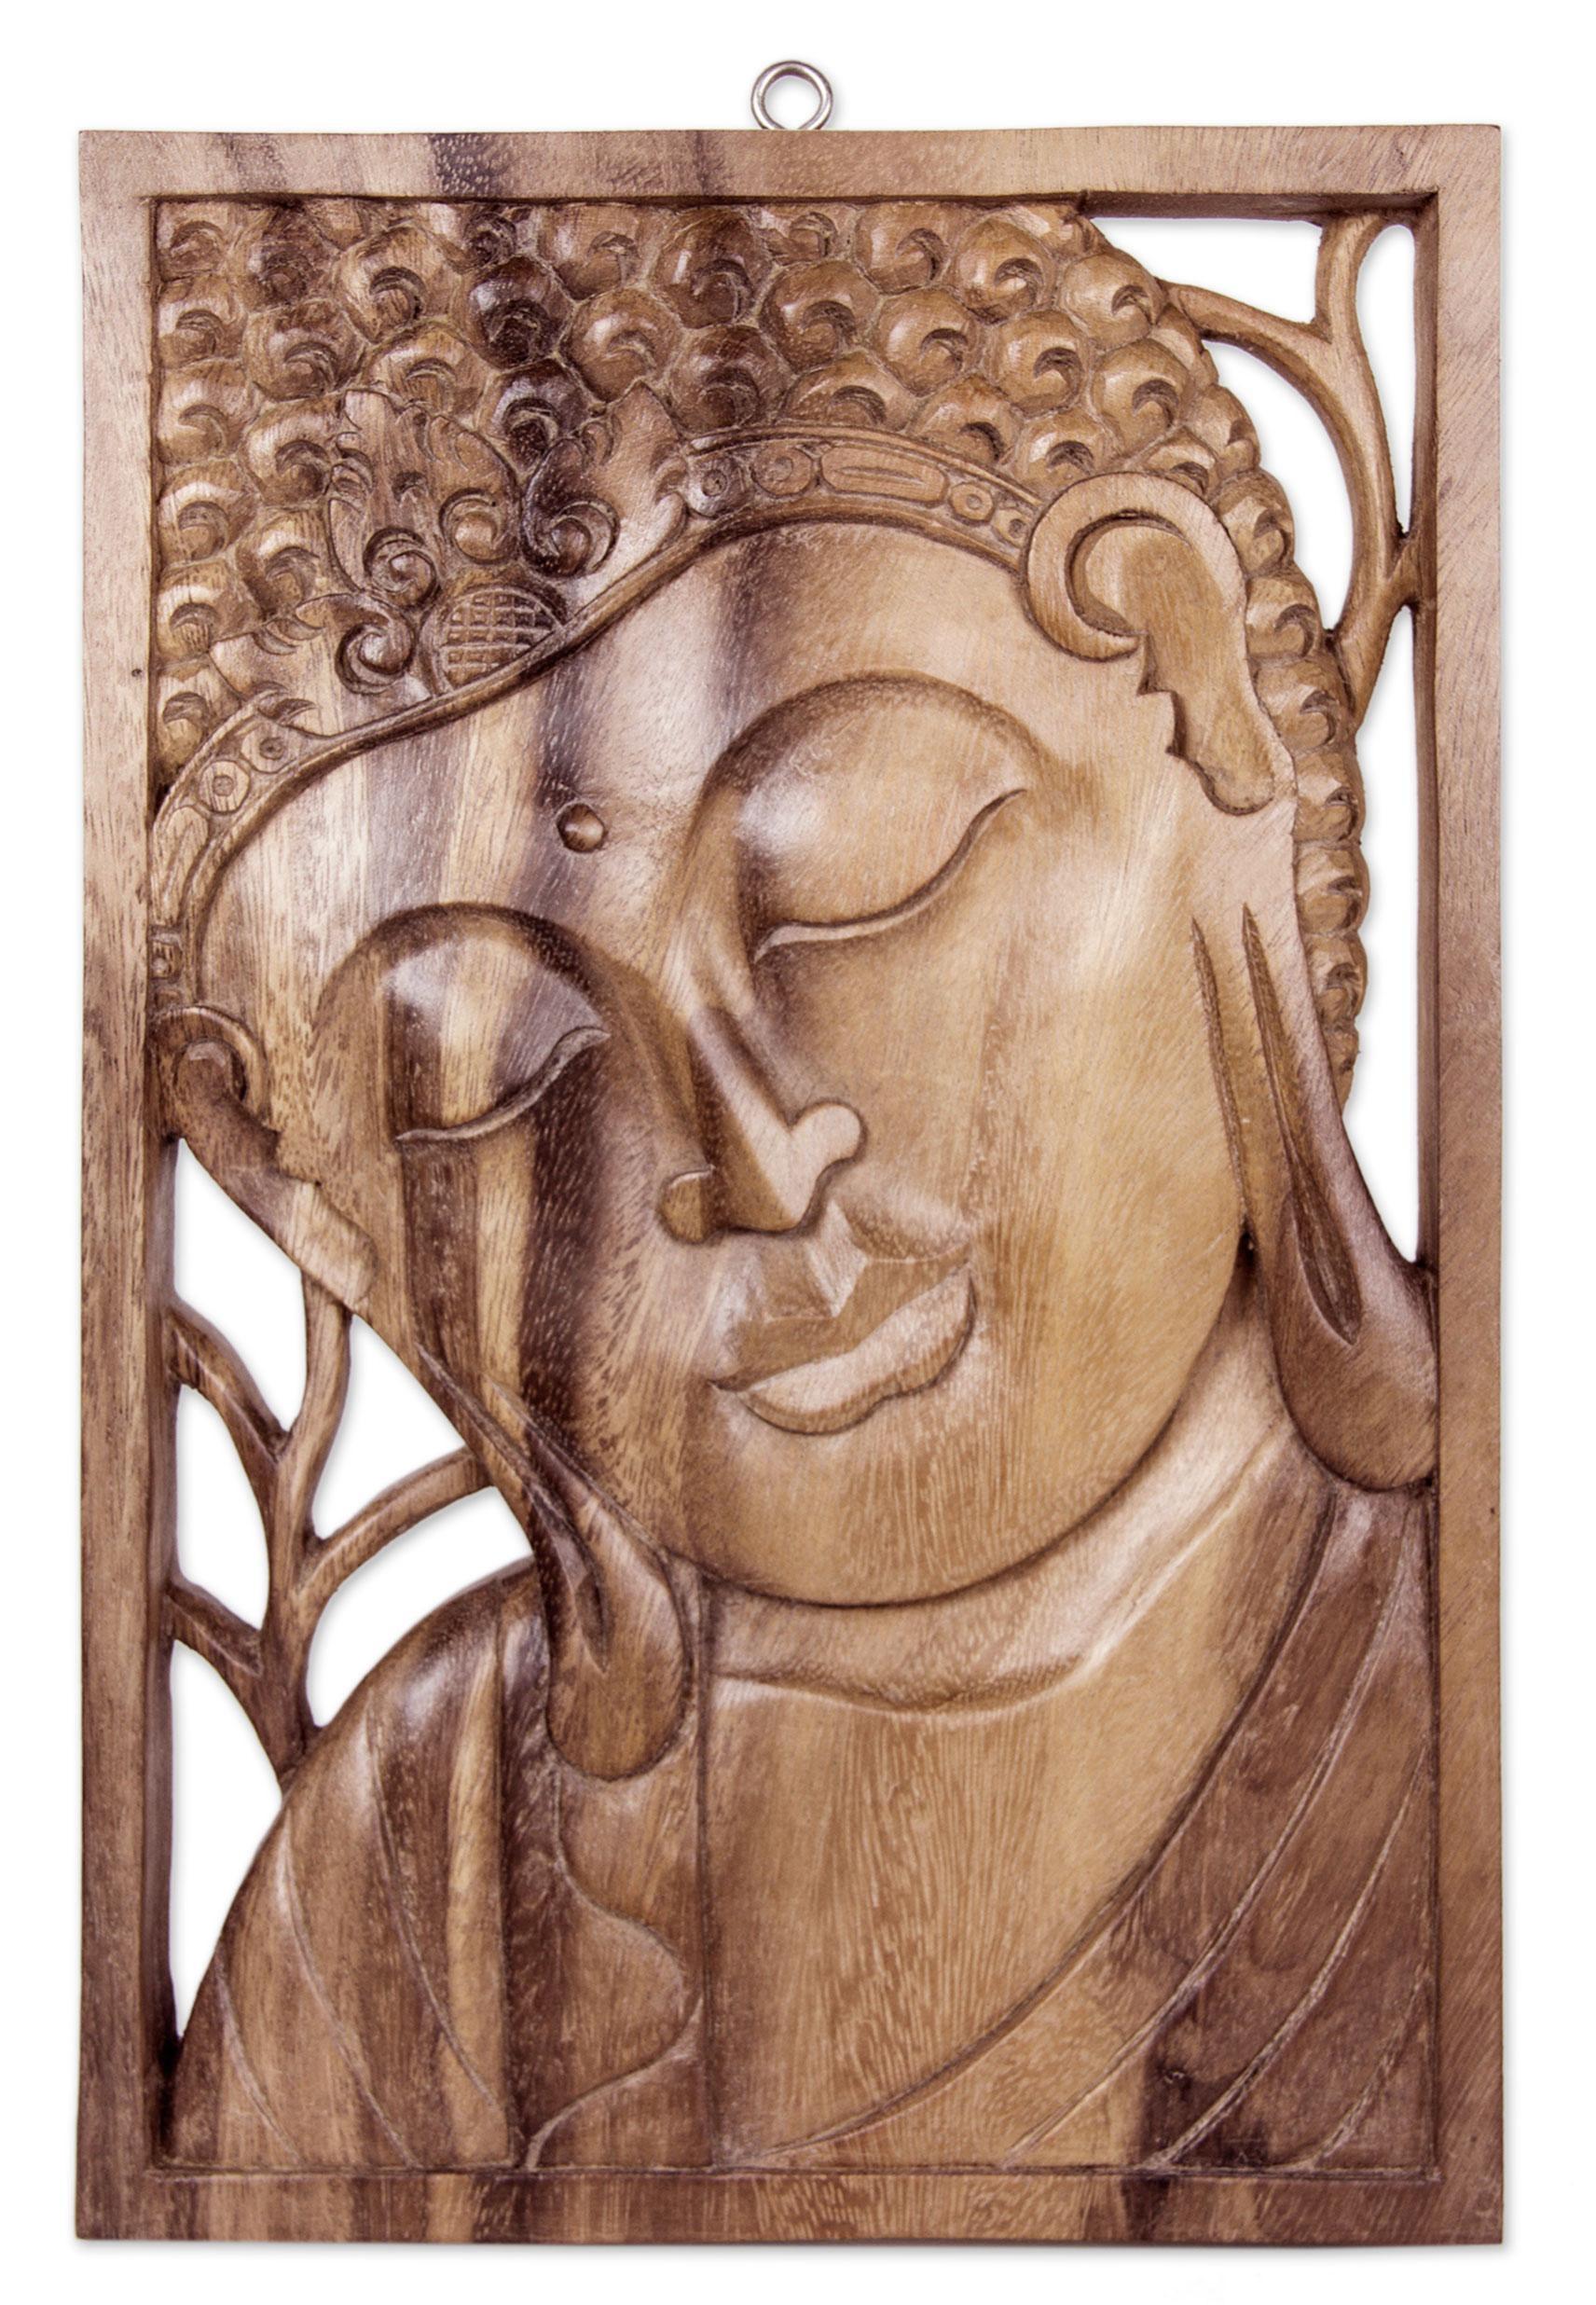 Zen Home Decor Ideas - Buddha Decor And Art | Novica intended for Buddha Wooden Wall Art